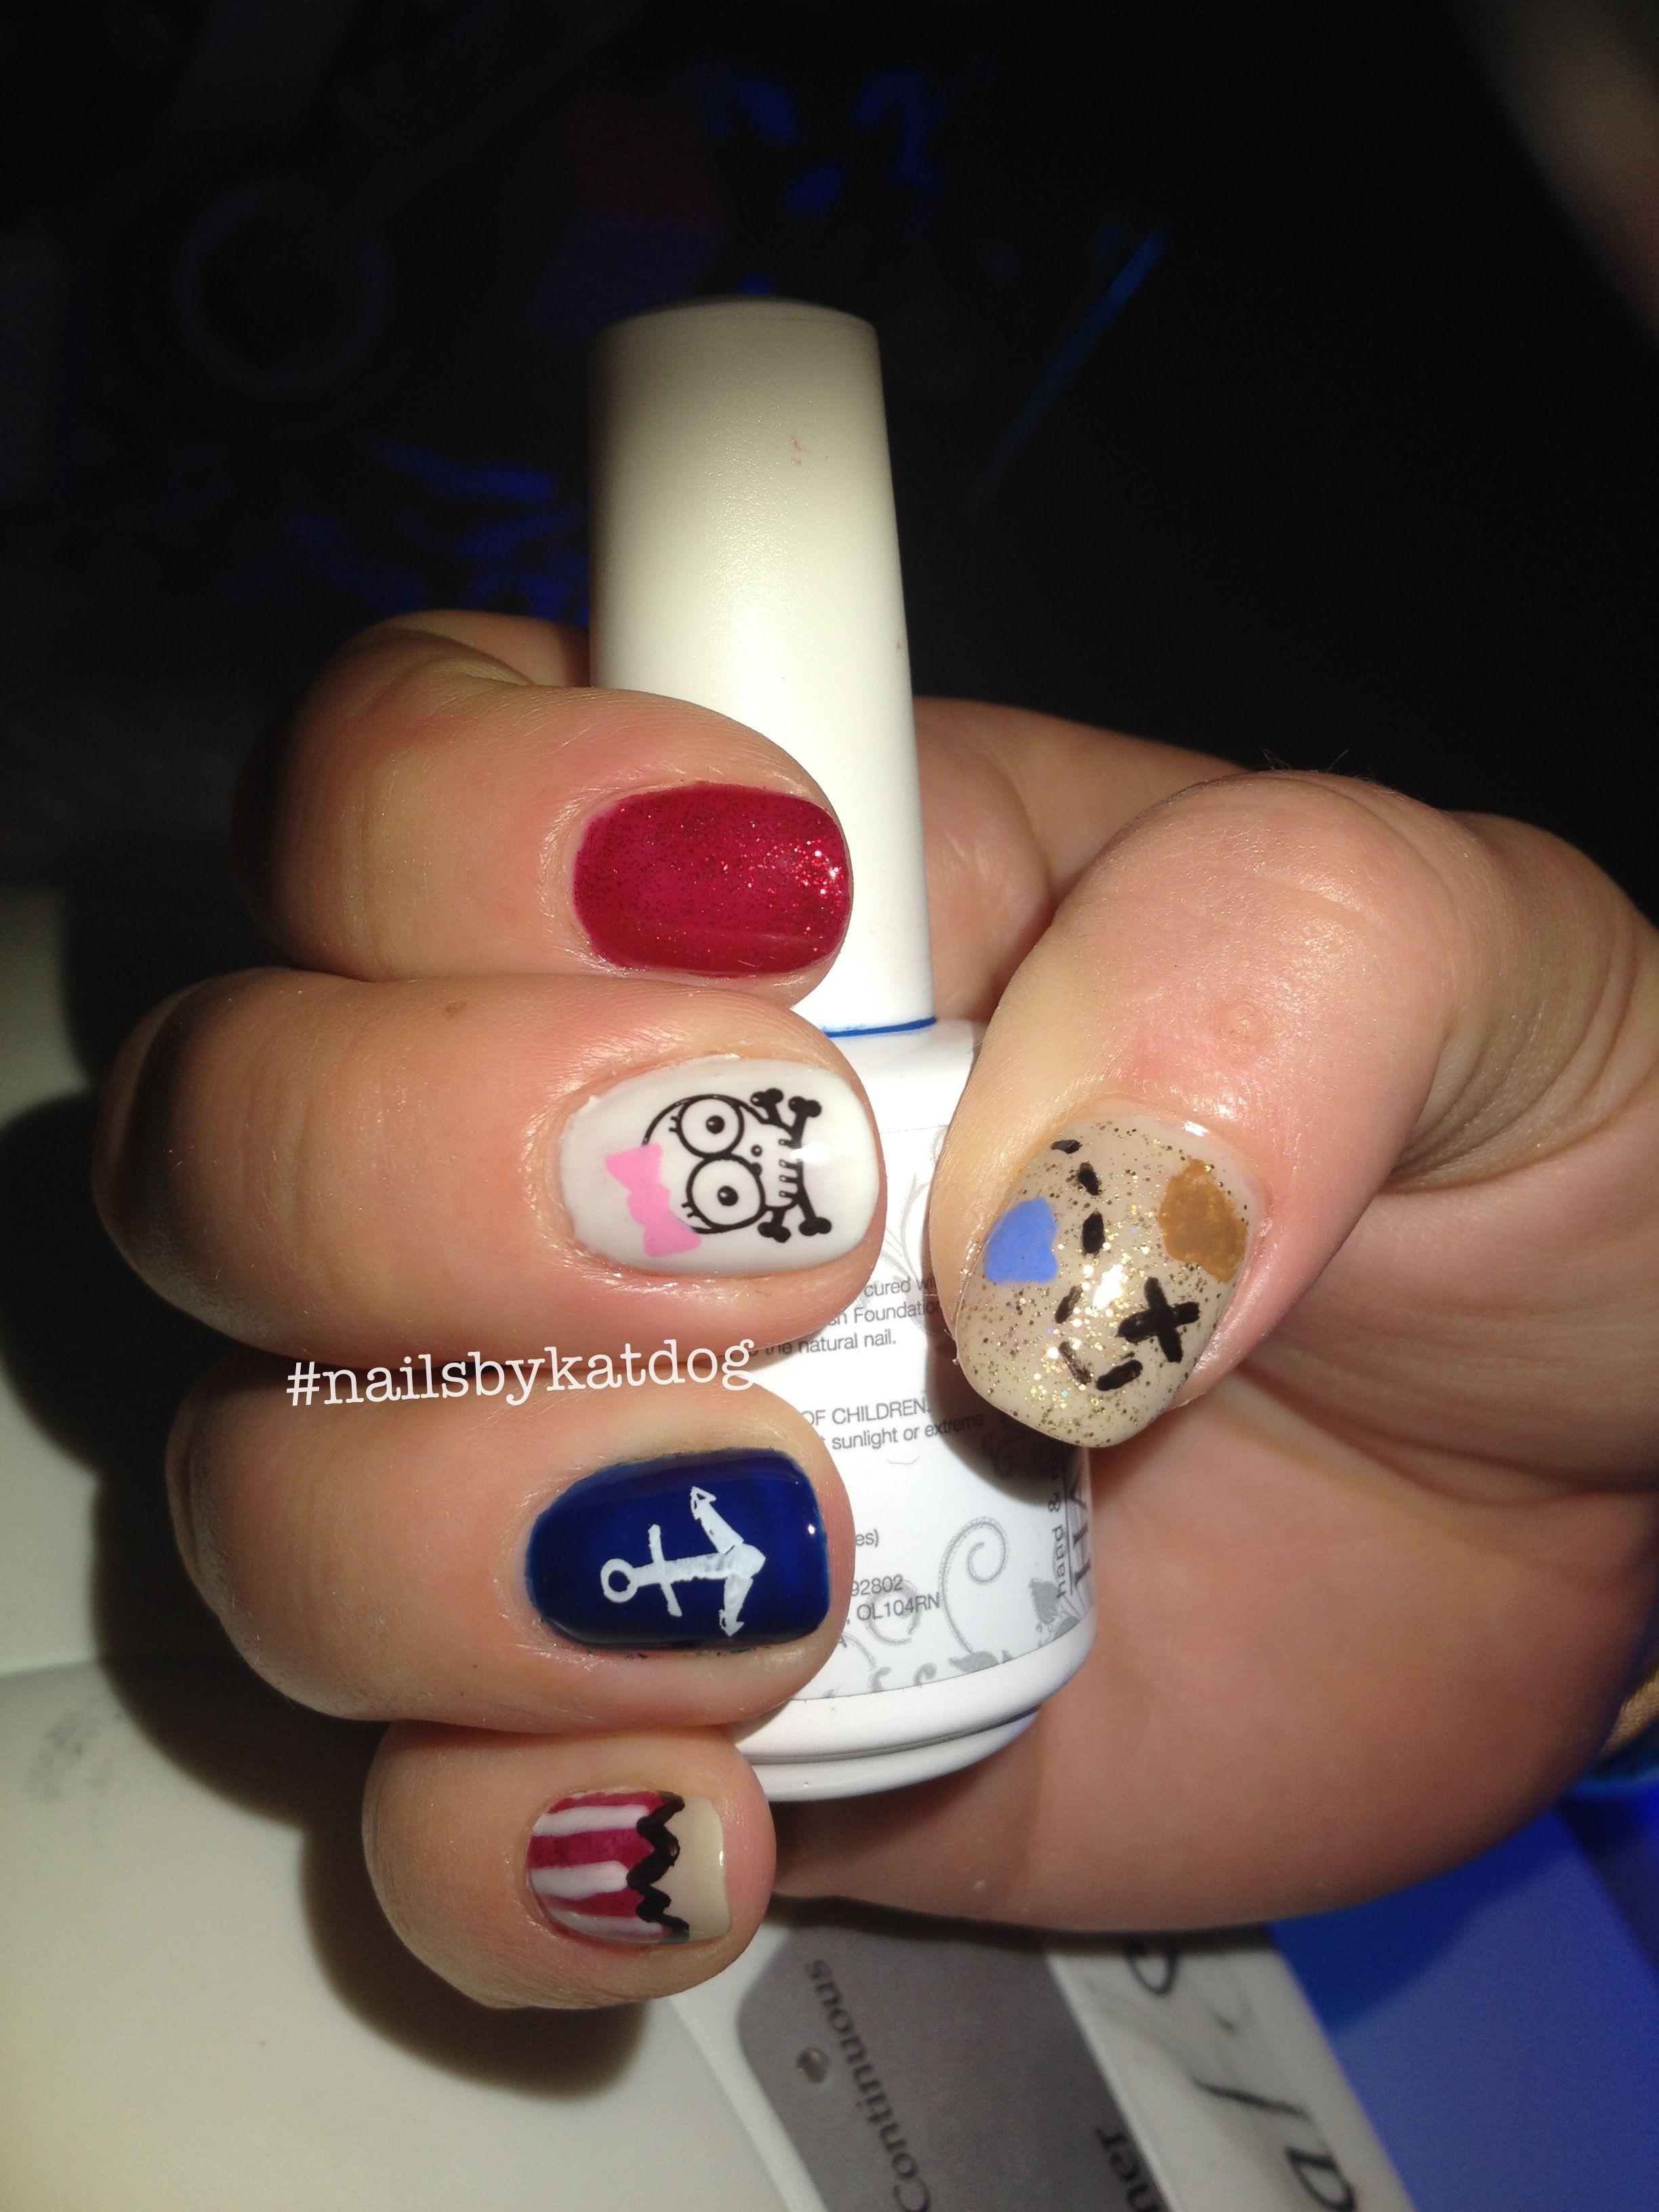 Pirate nails  #nails #nailart #gelish #gelishart #konad #gelishnailart #nailsbykatdog